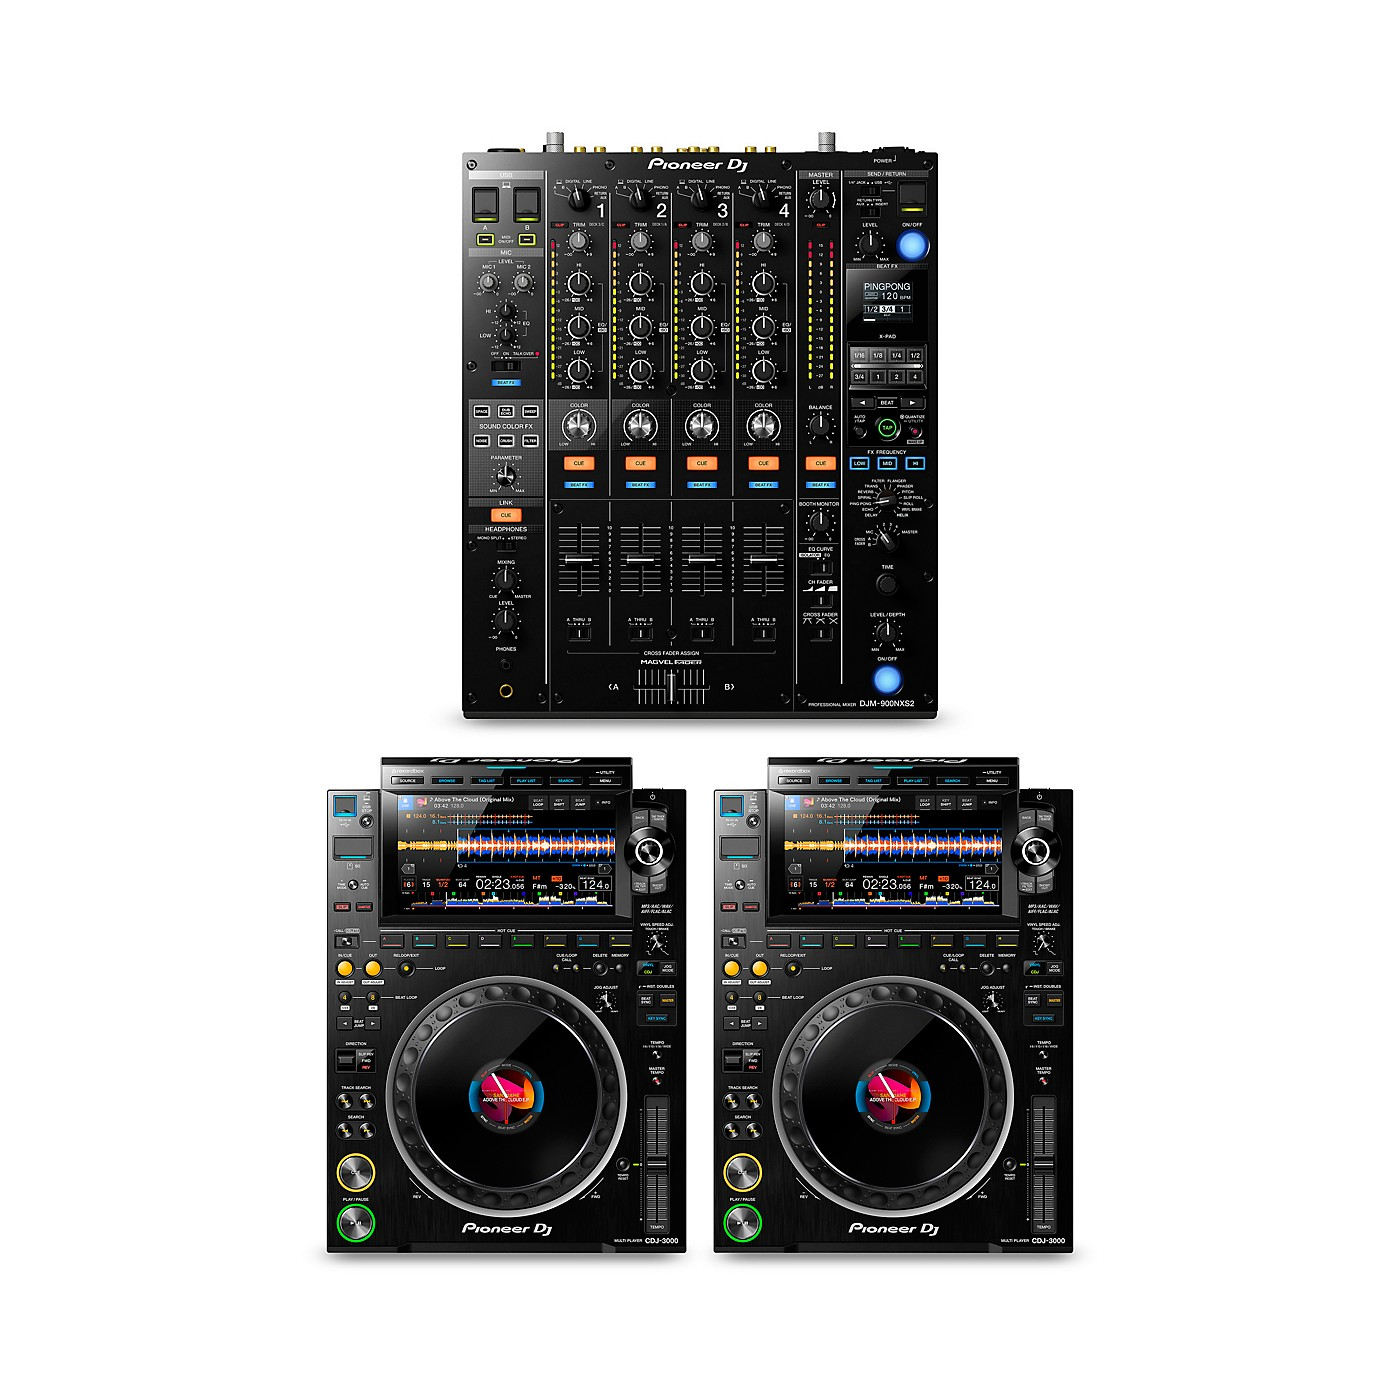 Pioneer DJ DJ Package with DJM-900NXS2 Mixer and CDJ-3000 Media Players thumbnail